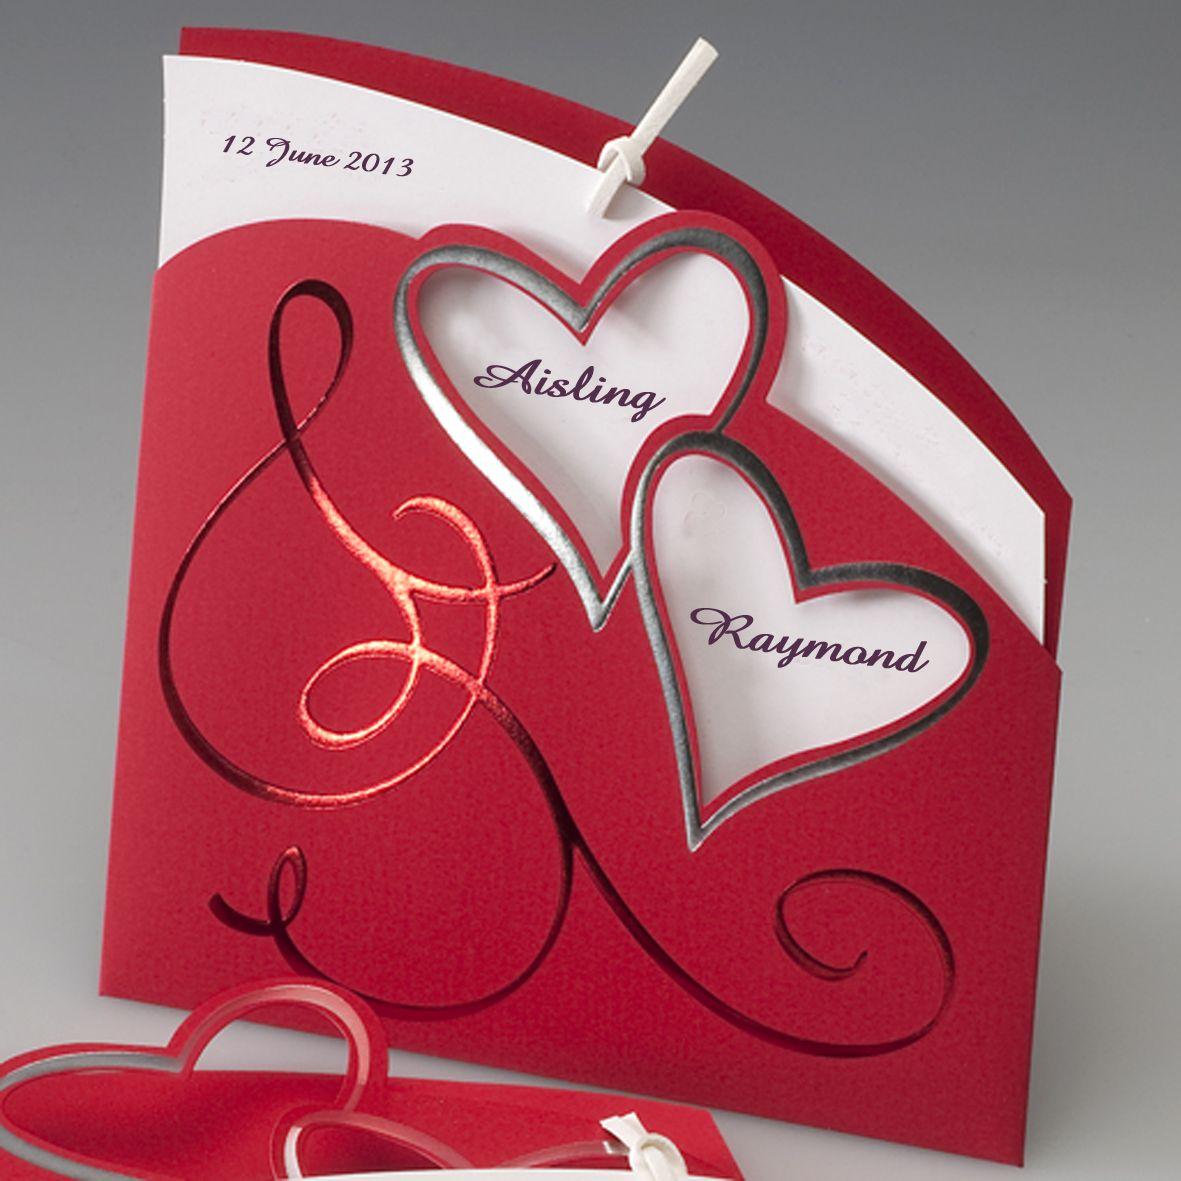 red and purple wedding invitation | wedding stationery | pinterest, Wedding invitations